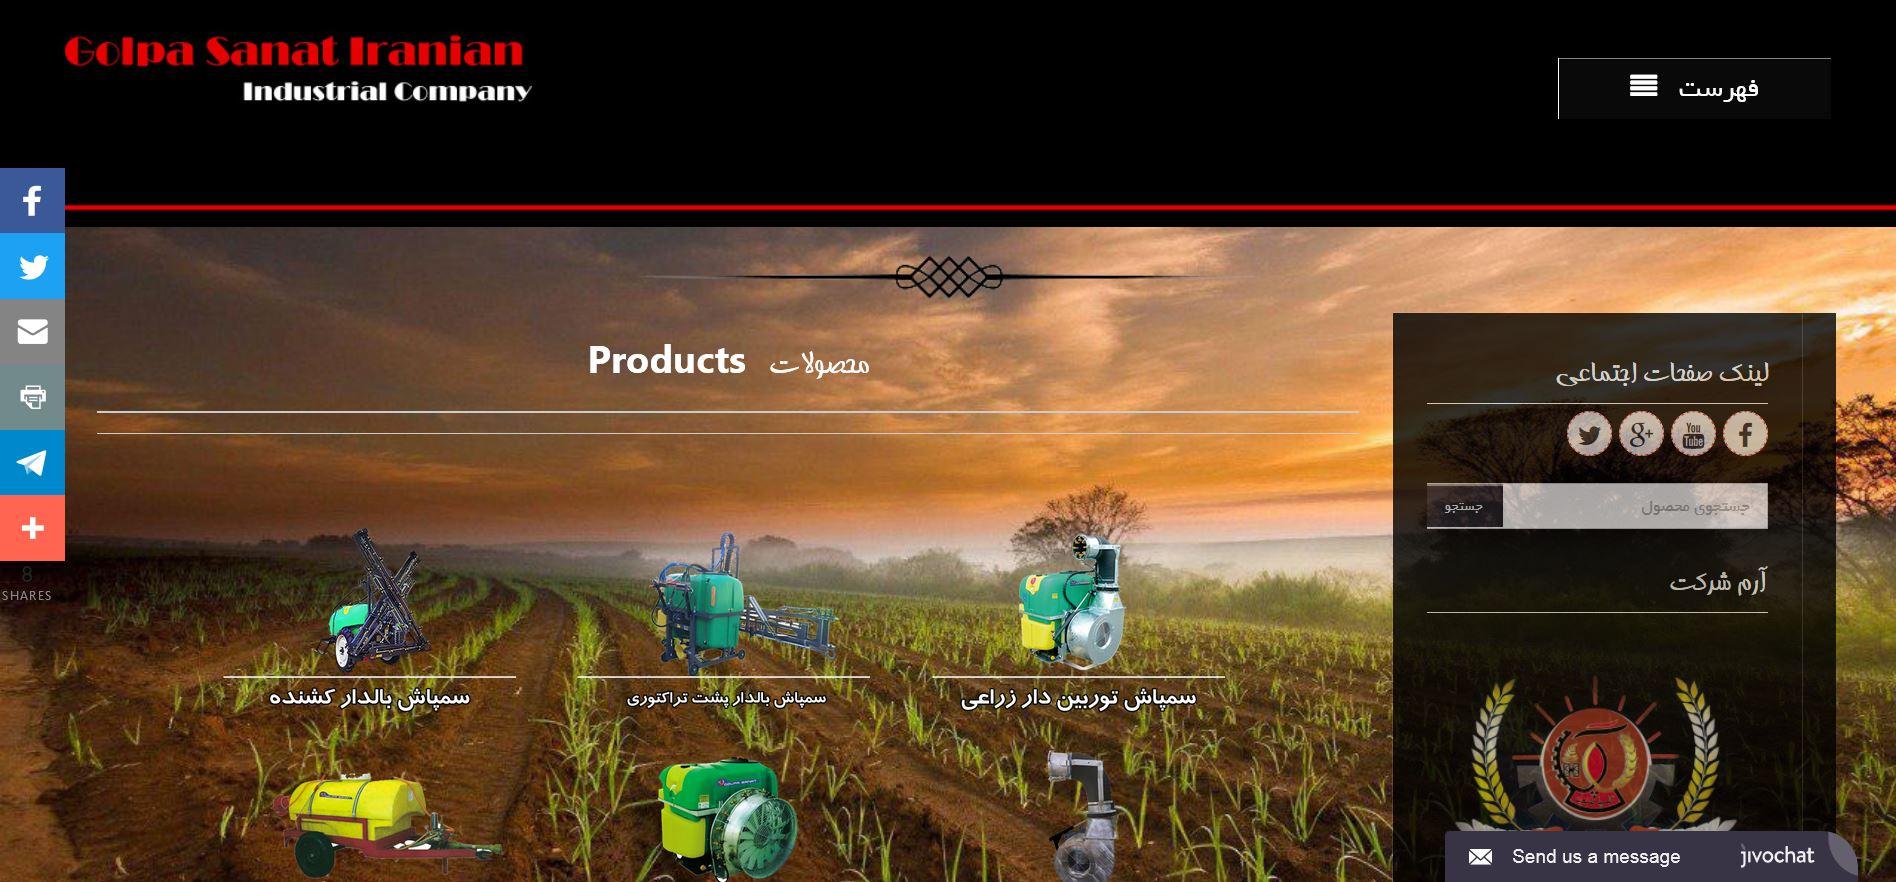 وبسایت شرکت گلپاصنعت ایرانیان